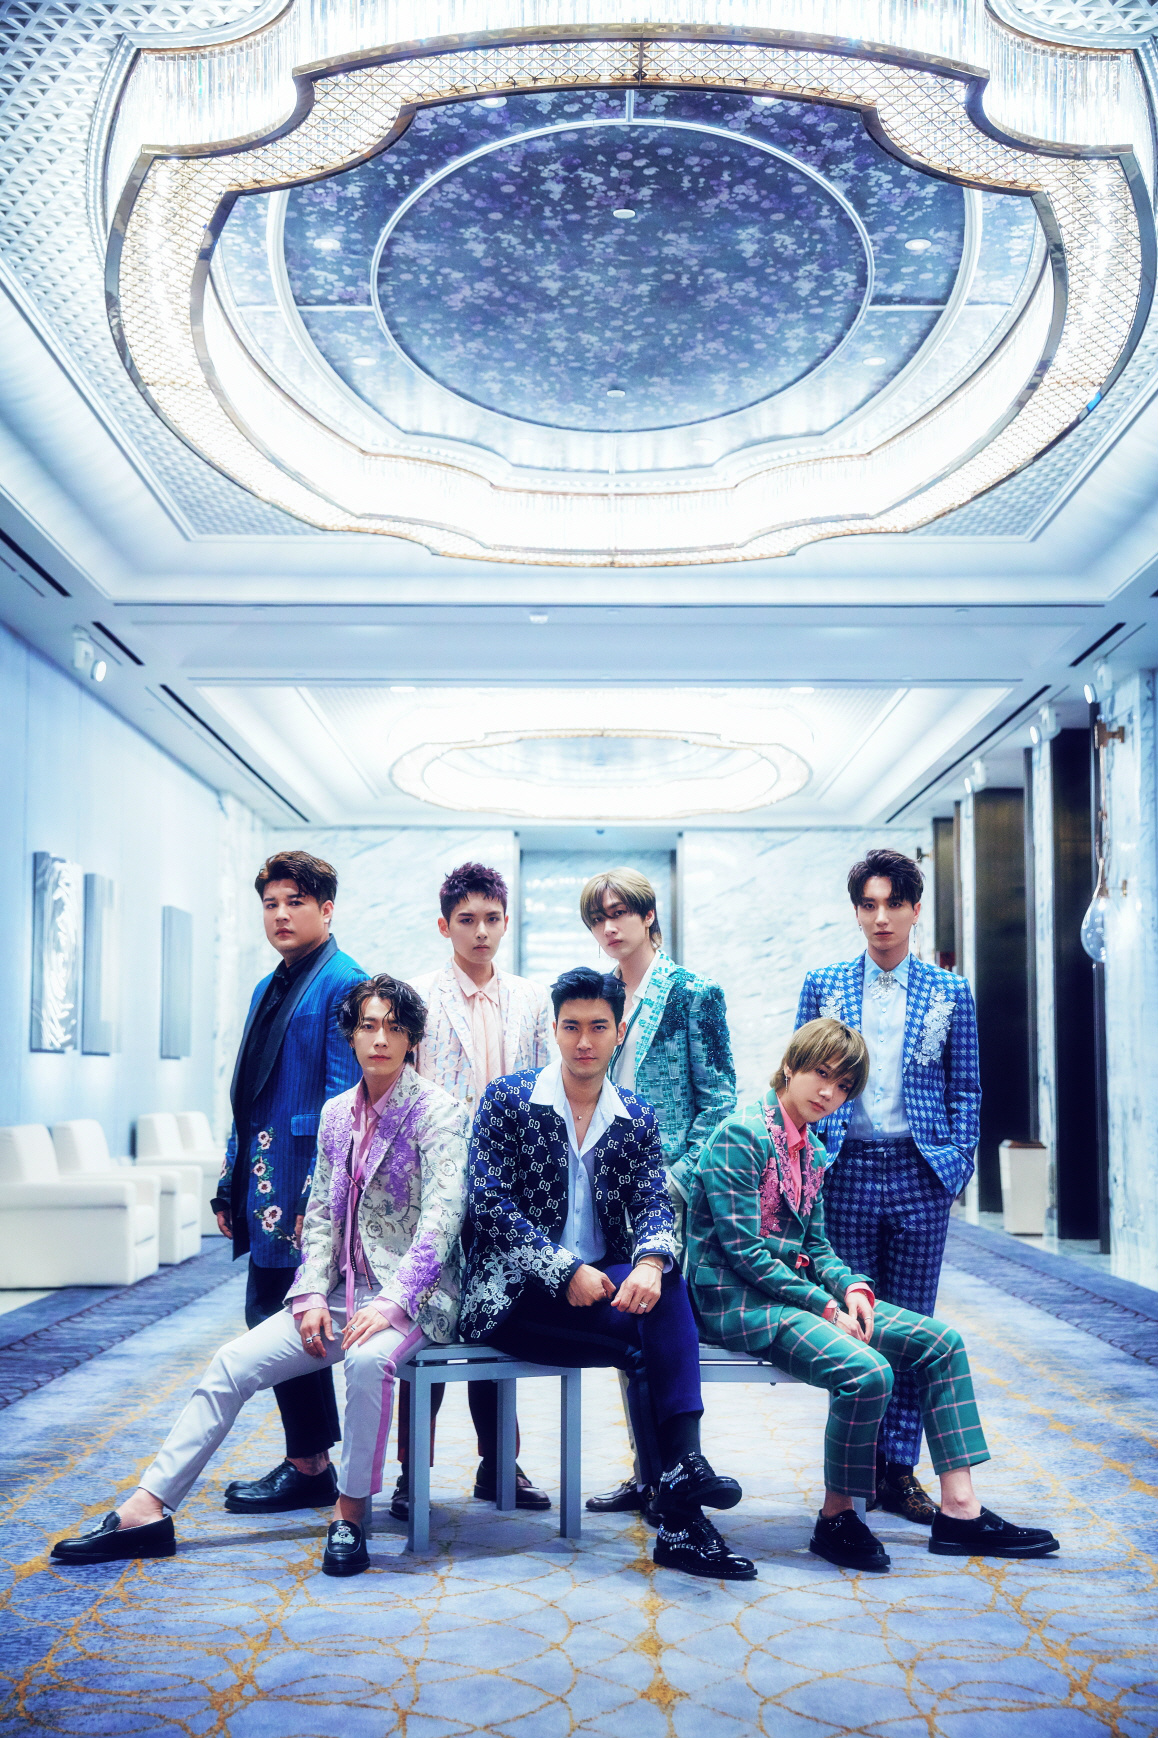 Super Junior10月8号携特别迷你专辑《One More Time》回归